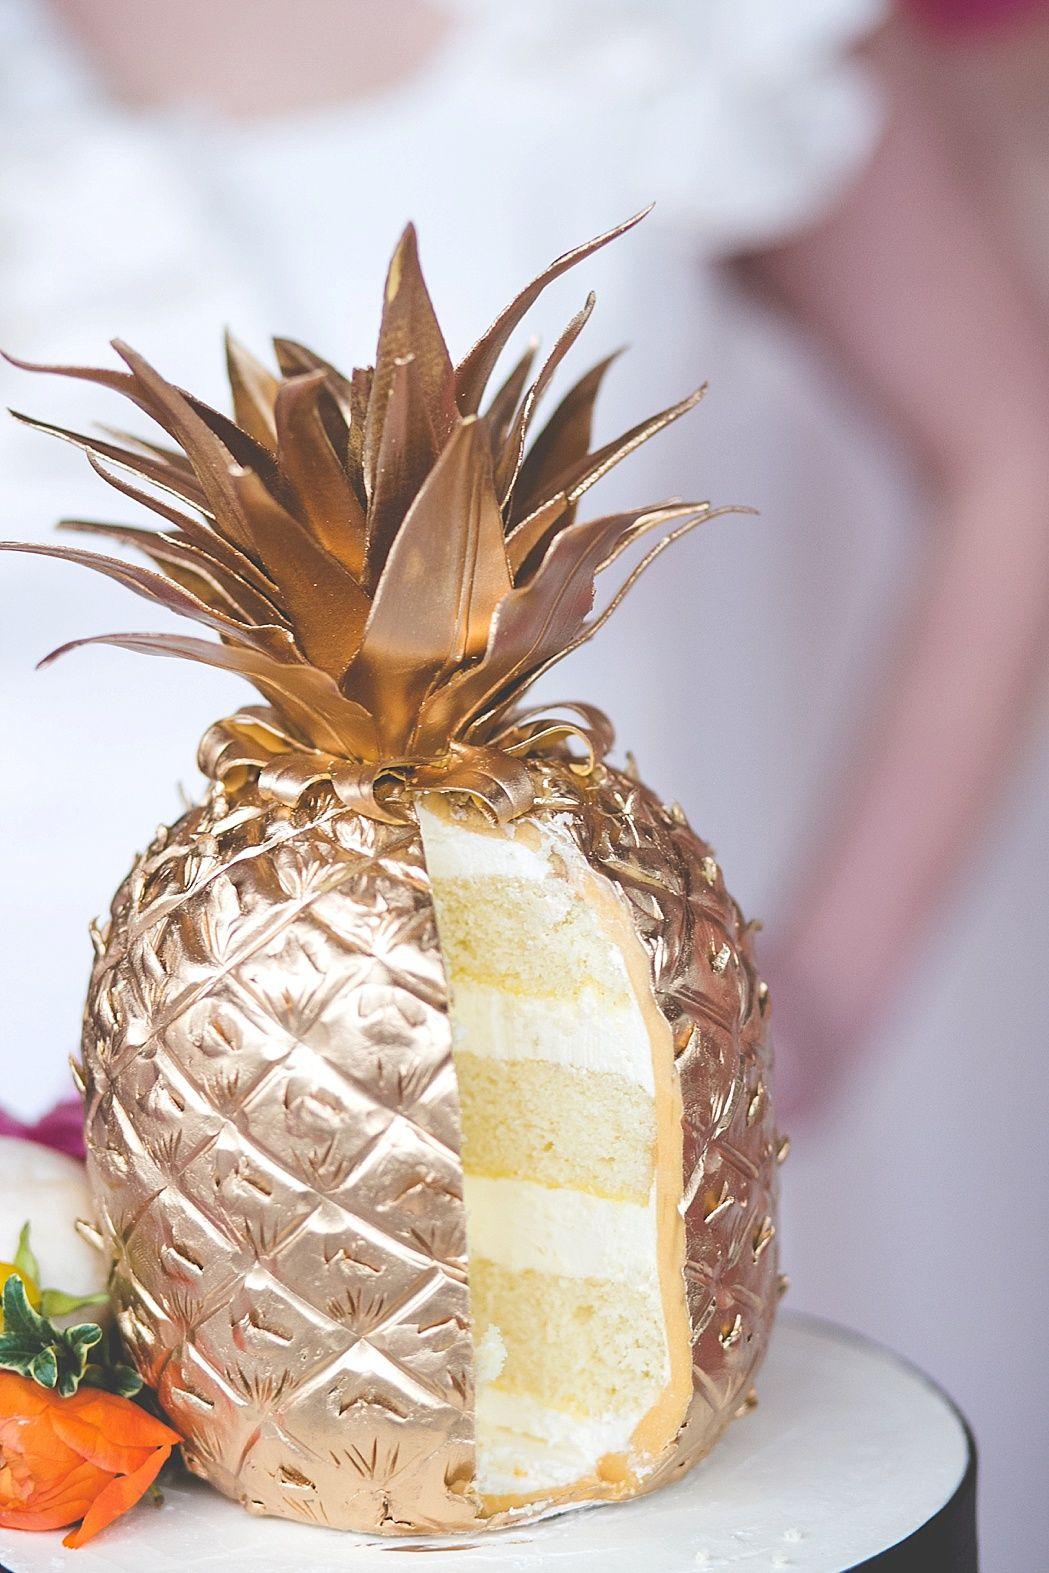 Pineapple Cake                                                                                                                                                                                 More